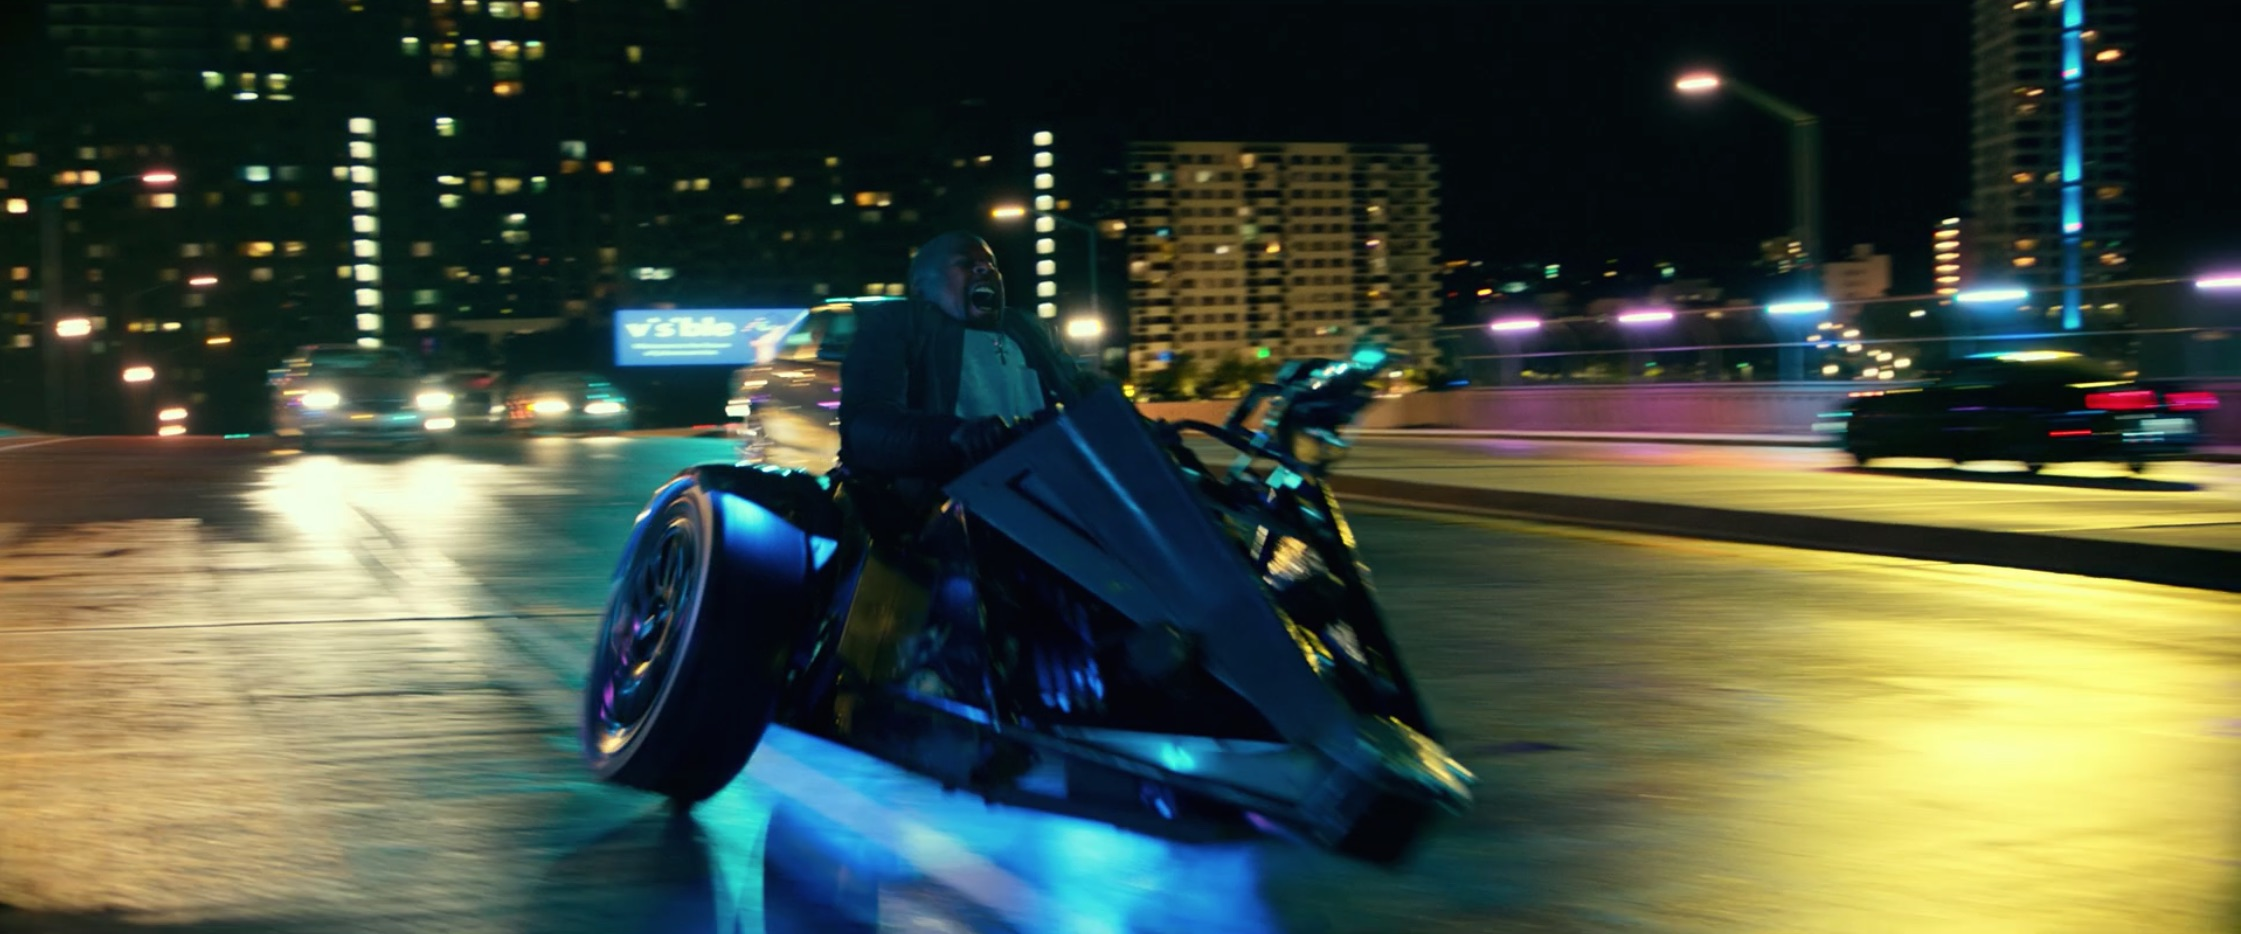 Bad Boys For Life side car action scene